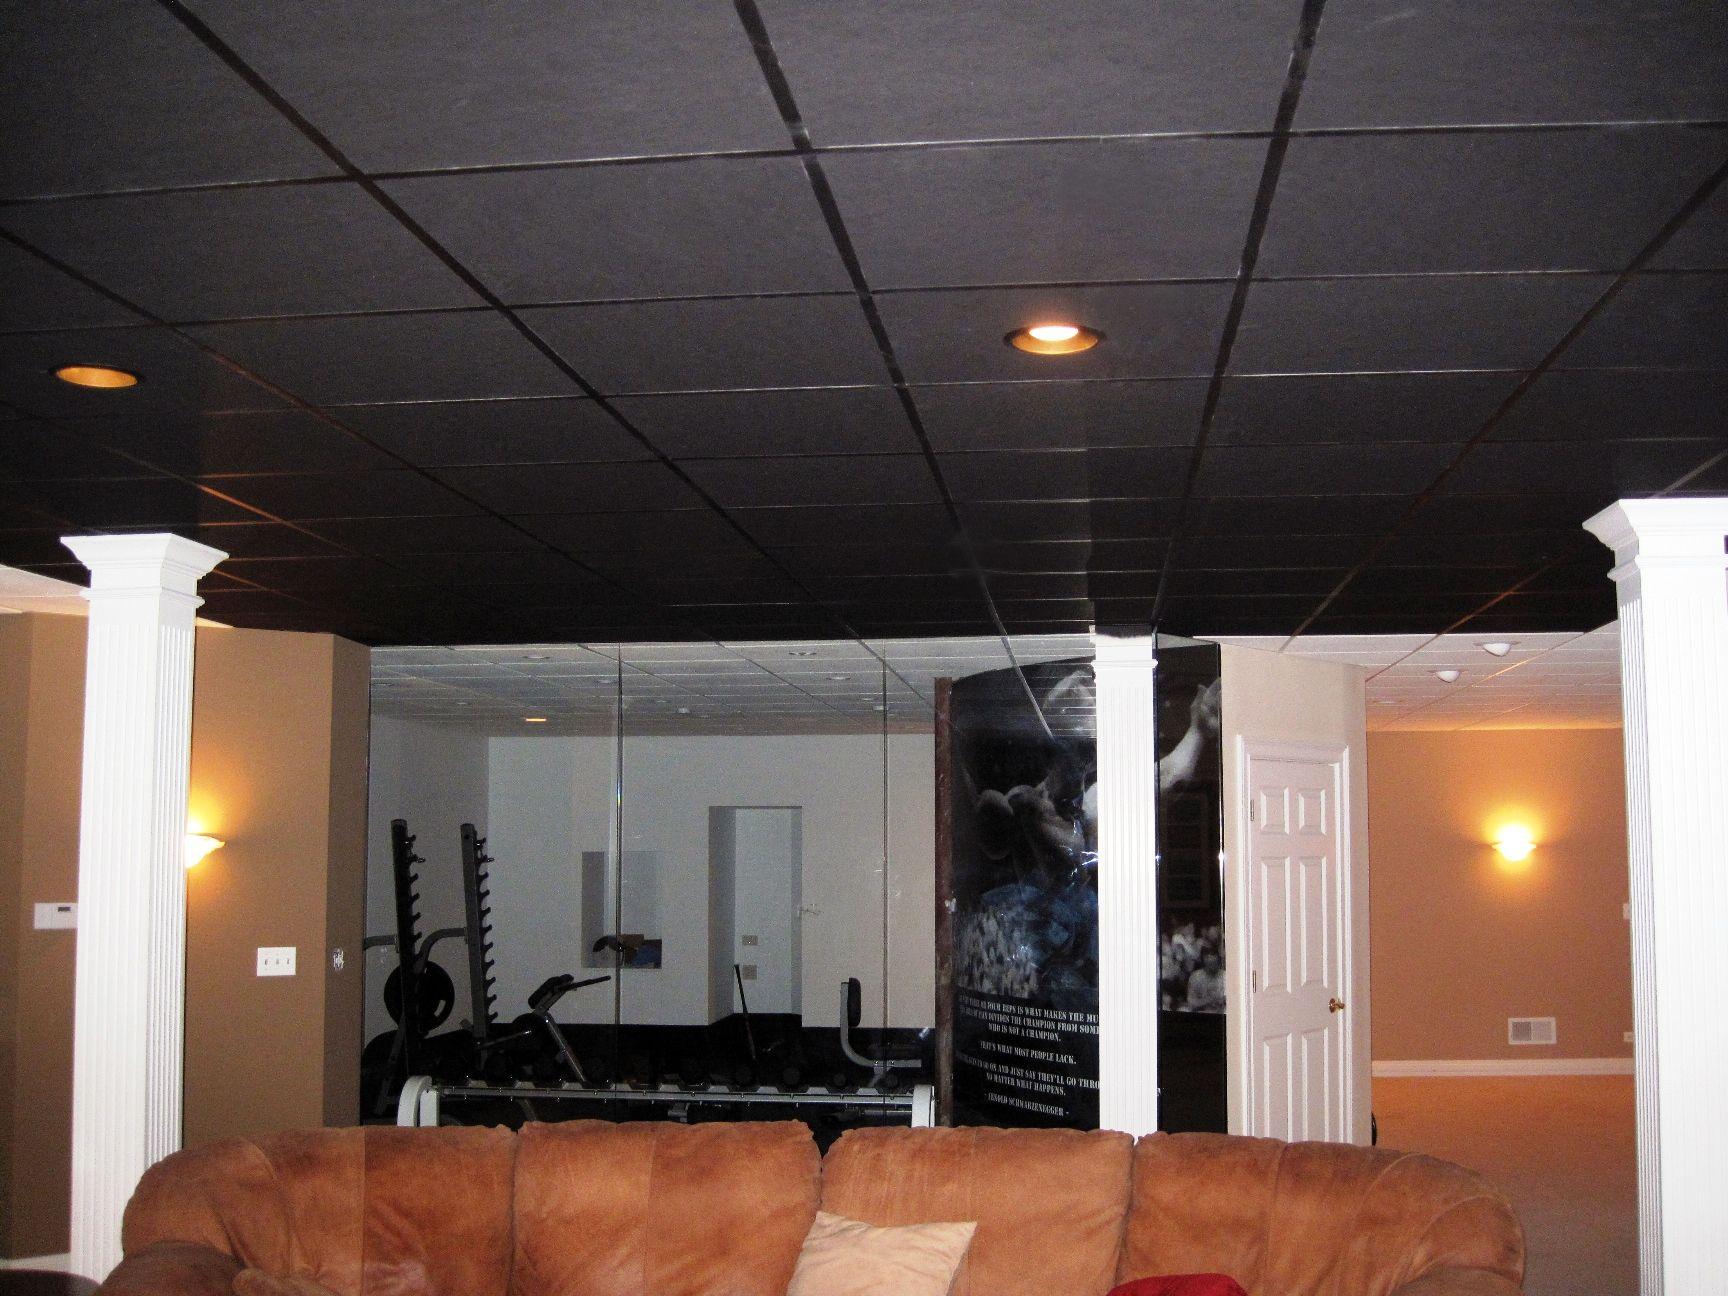 adhesive acoustical acoustic modern fiberglass ceiling ceilg armstrong floor installation tiles panels cheap long grid commercial drop kitchen basement flooring